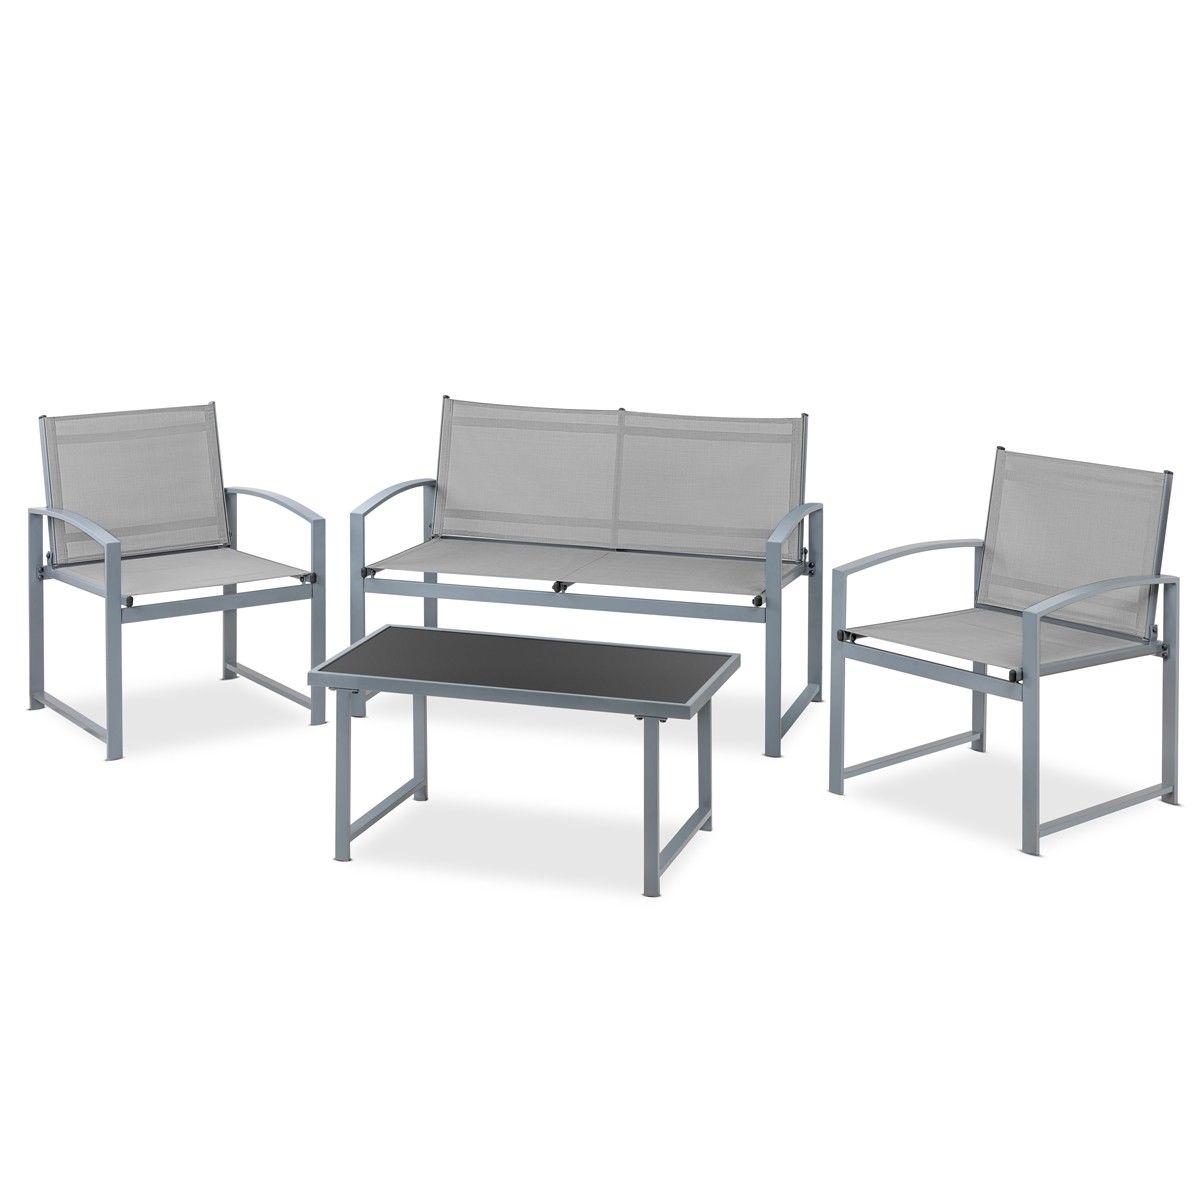 Pack jardín Mesa + sofá + sillas solo 89€